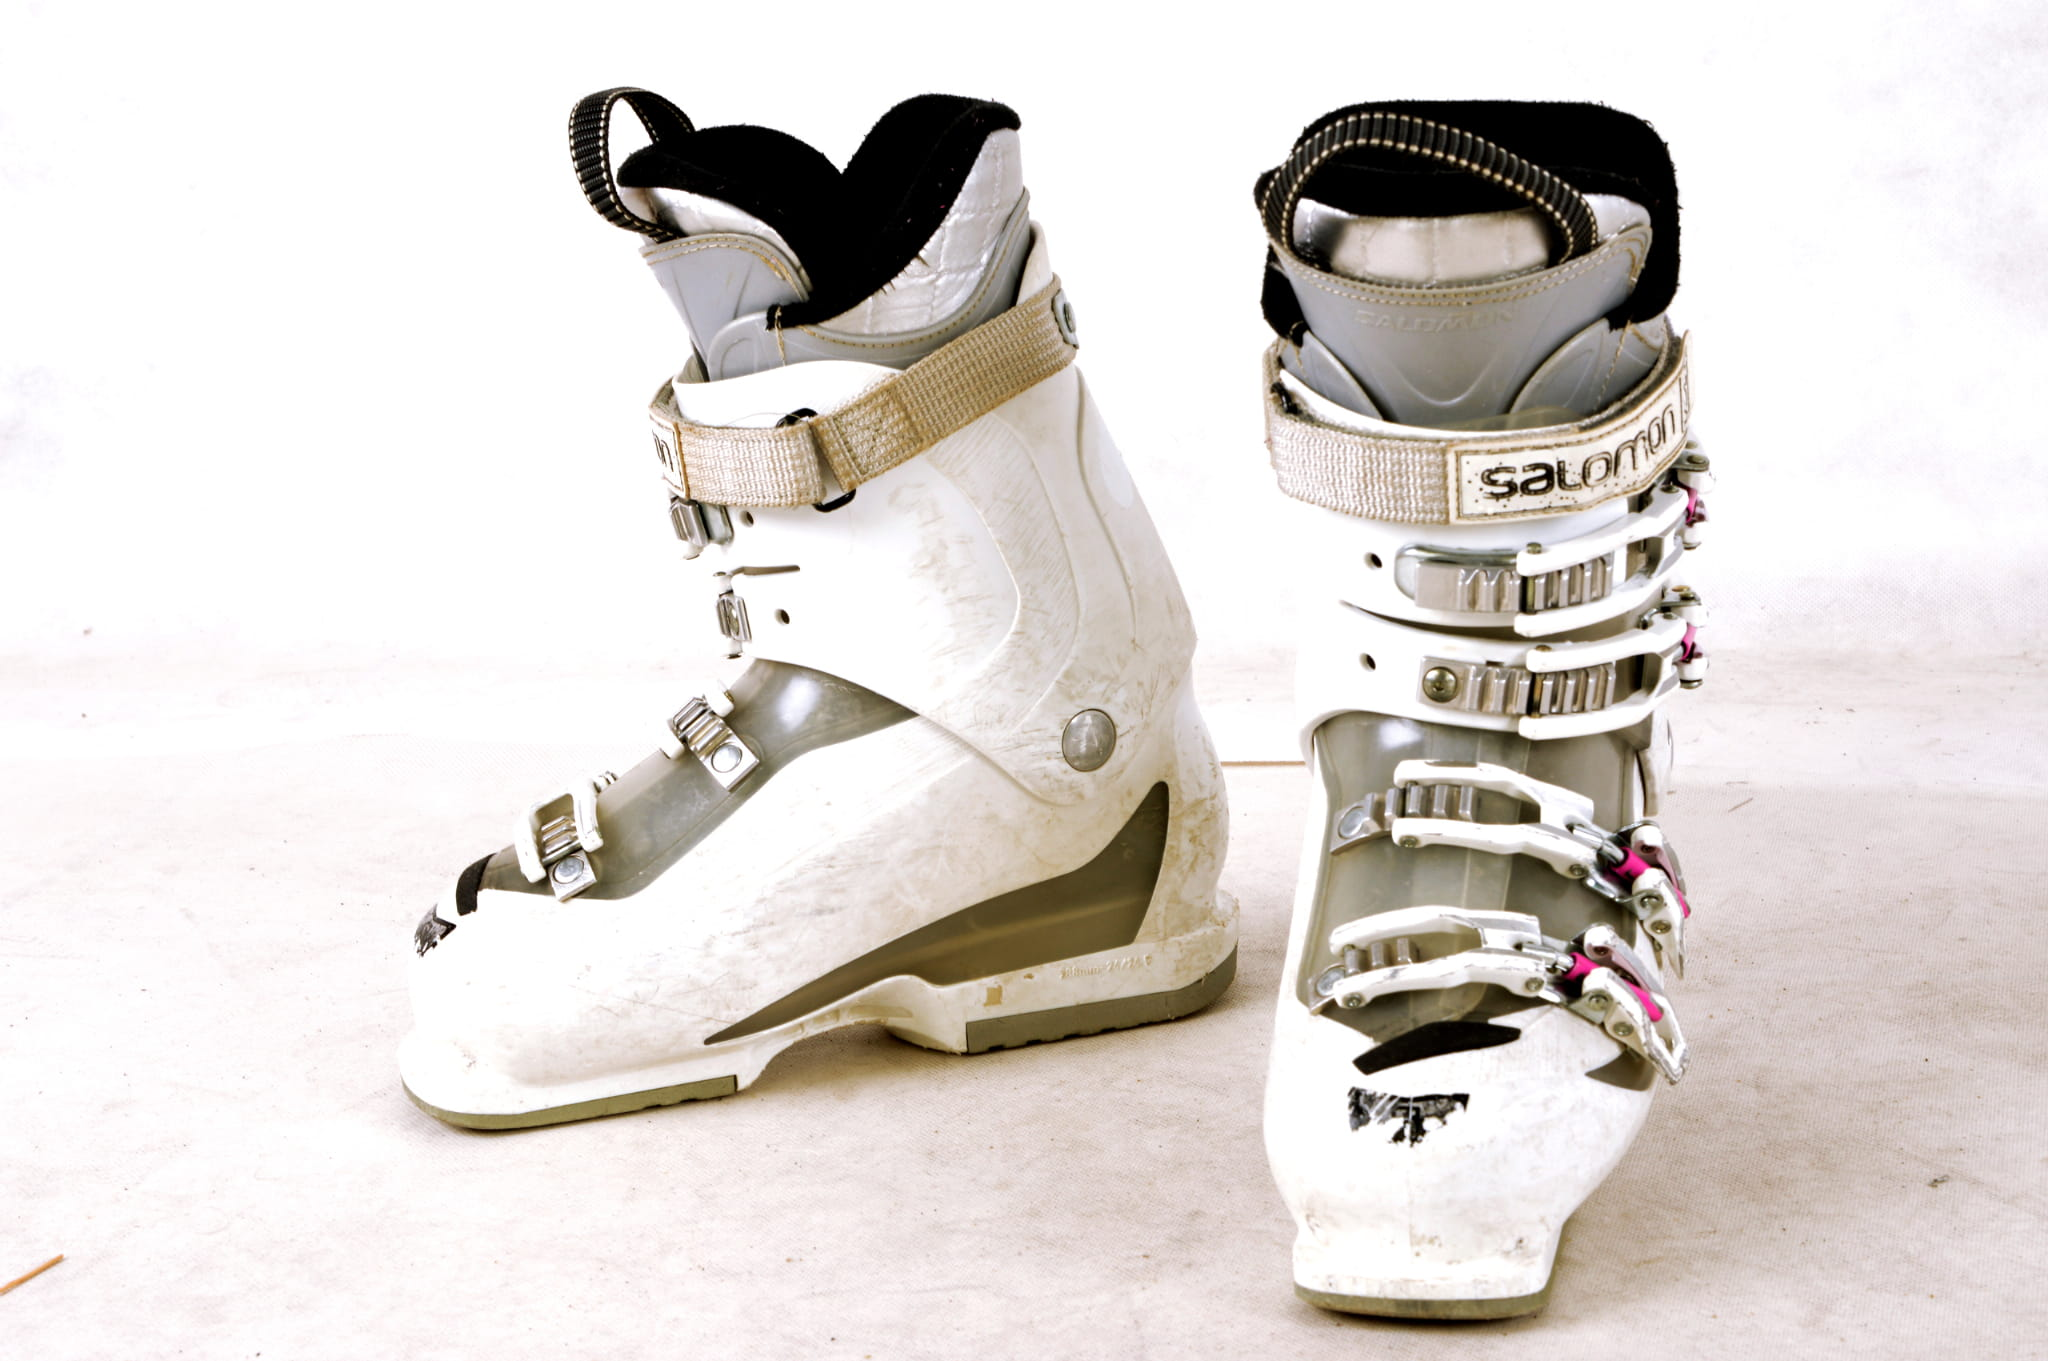 Buty narciarskie SALOMON DIVINE MG r.24 (37,5) z8